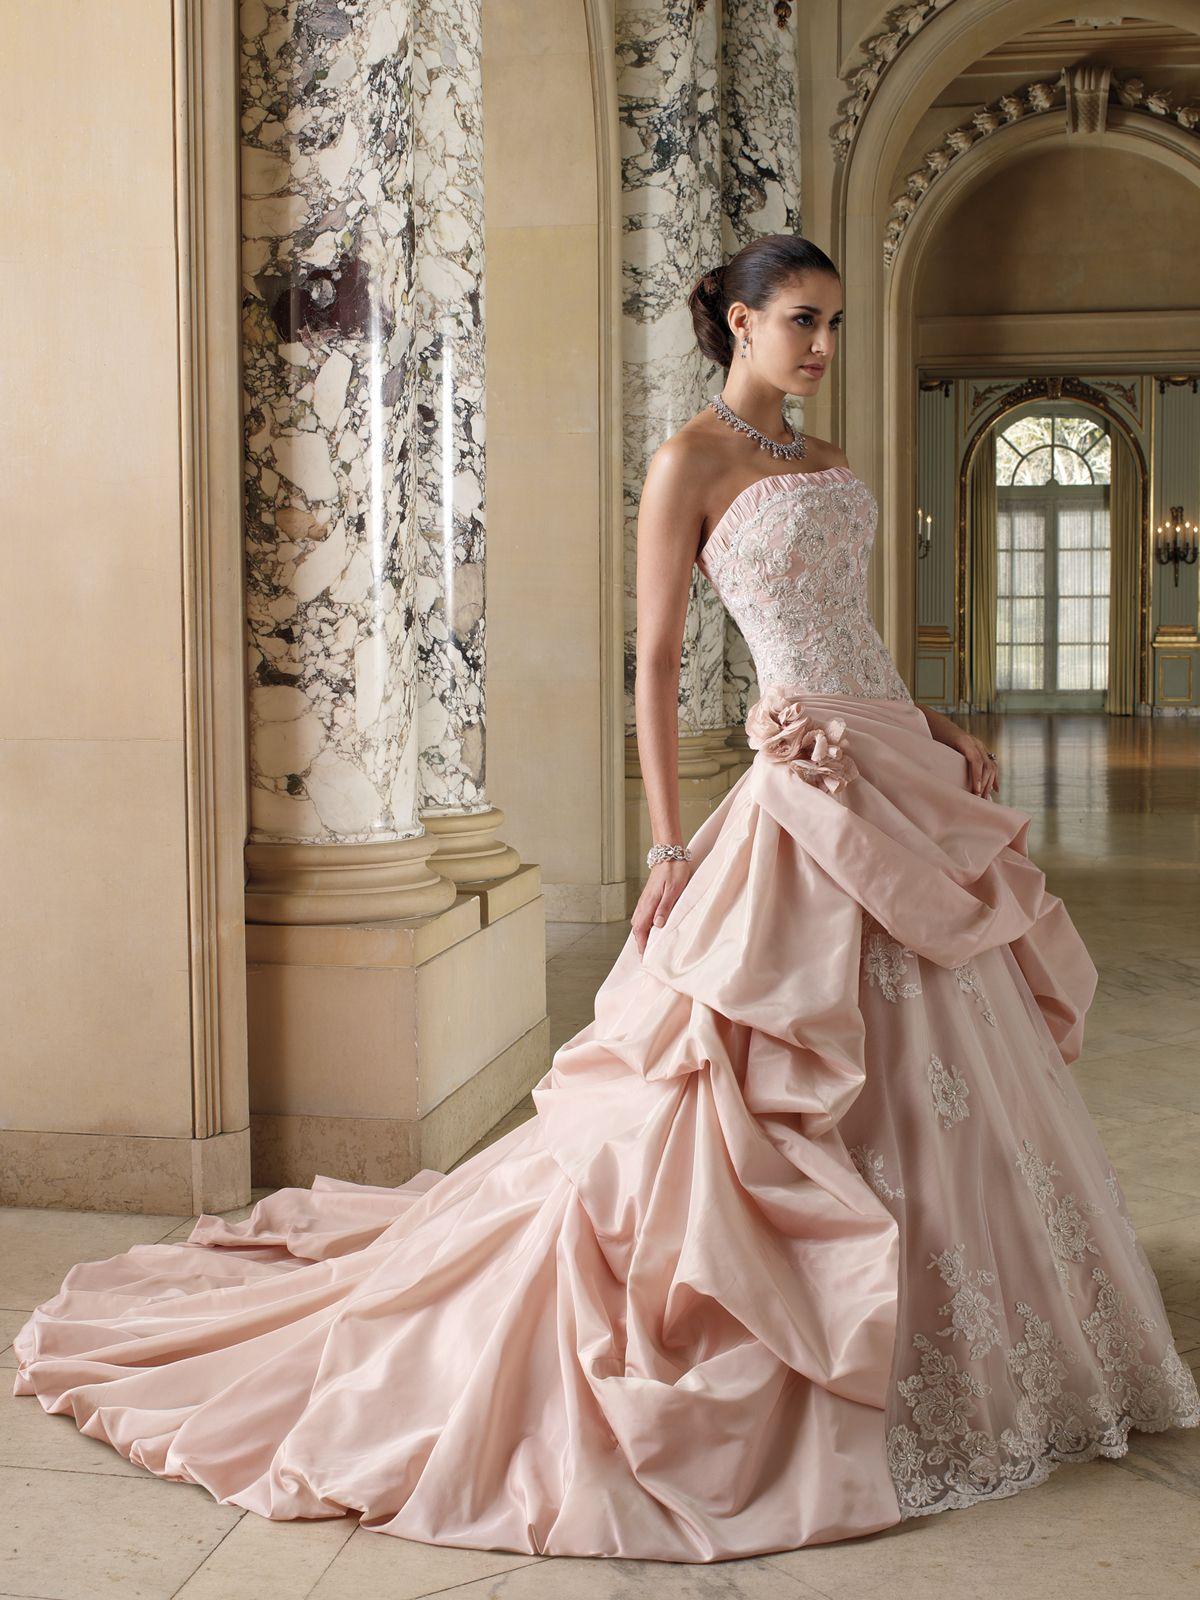 Weddings Abroad - Destination Weddings: I Love.......Coloured Bridal ...